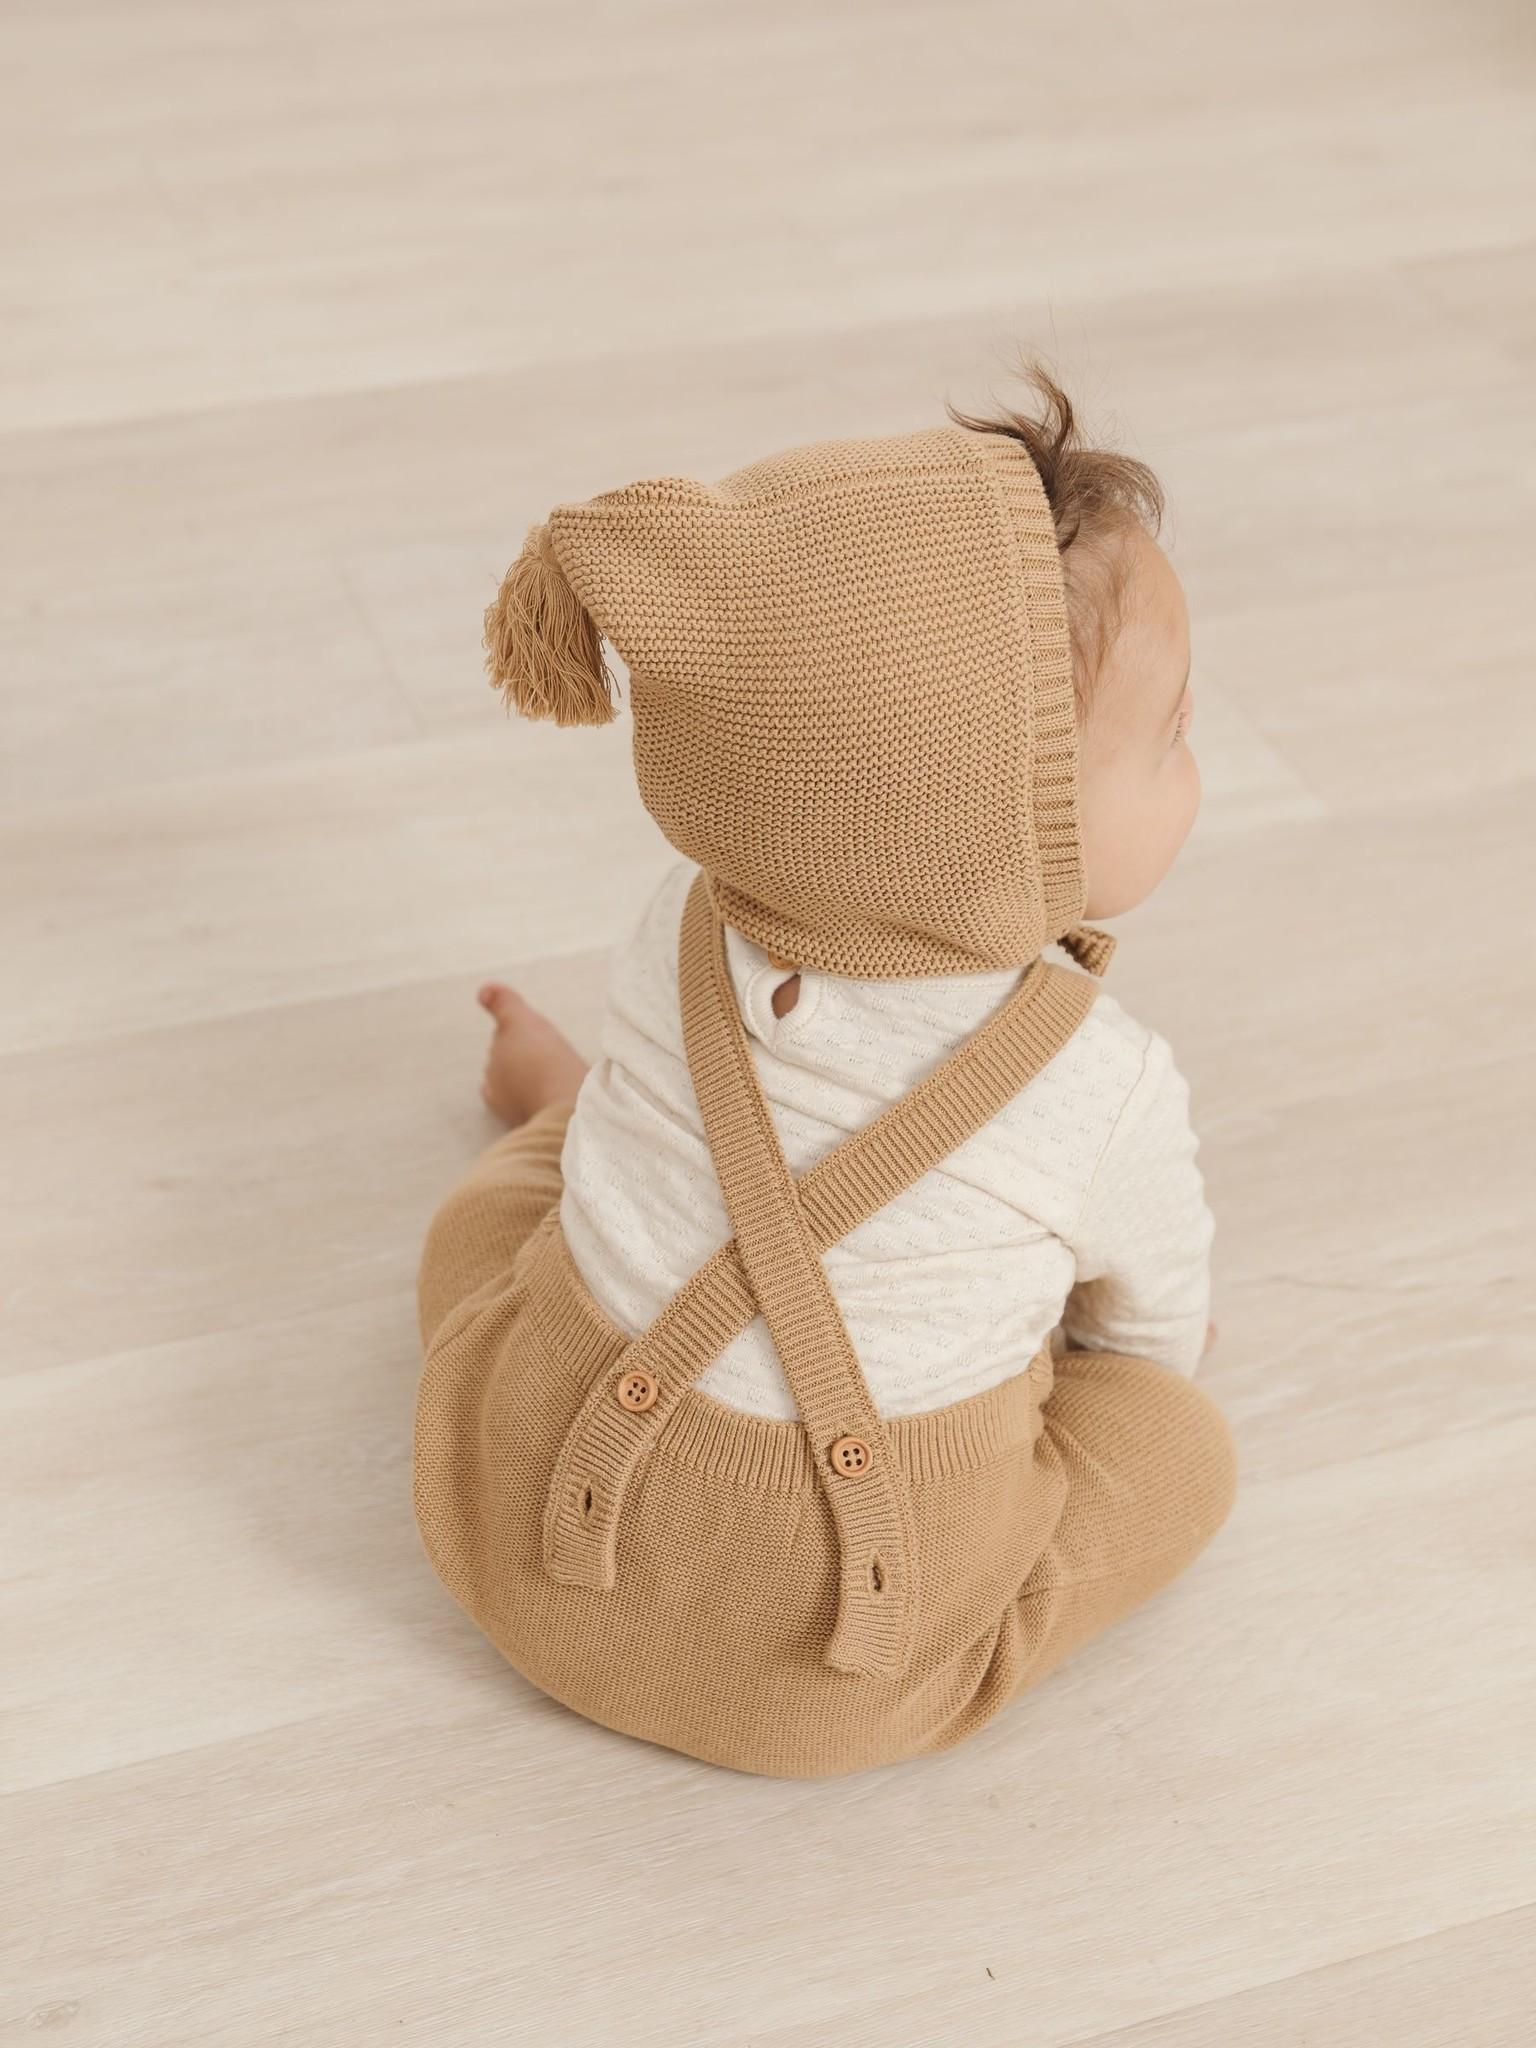 Quincy Mae Knit Pixie Bonnet - organic sweater knit (Honey)